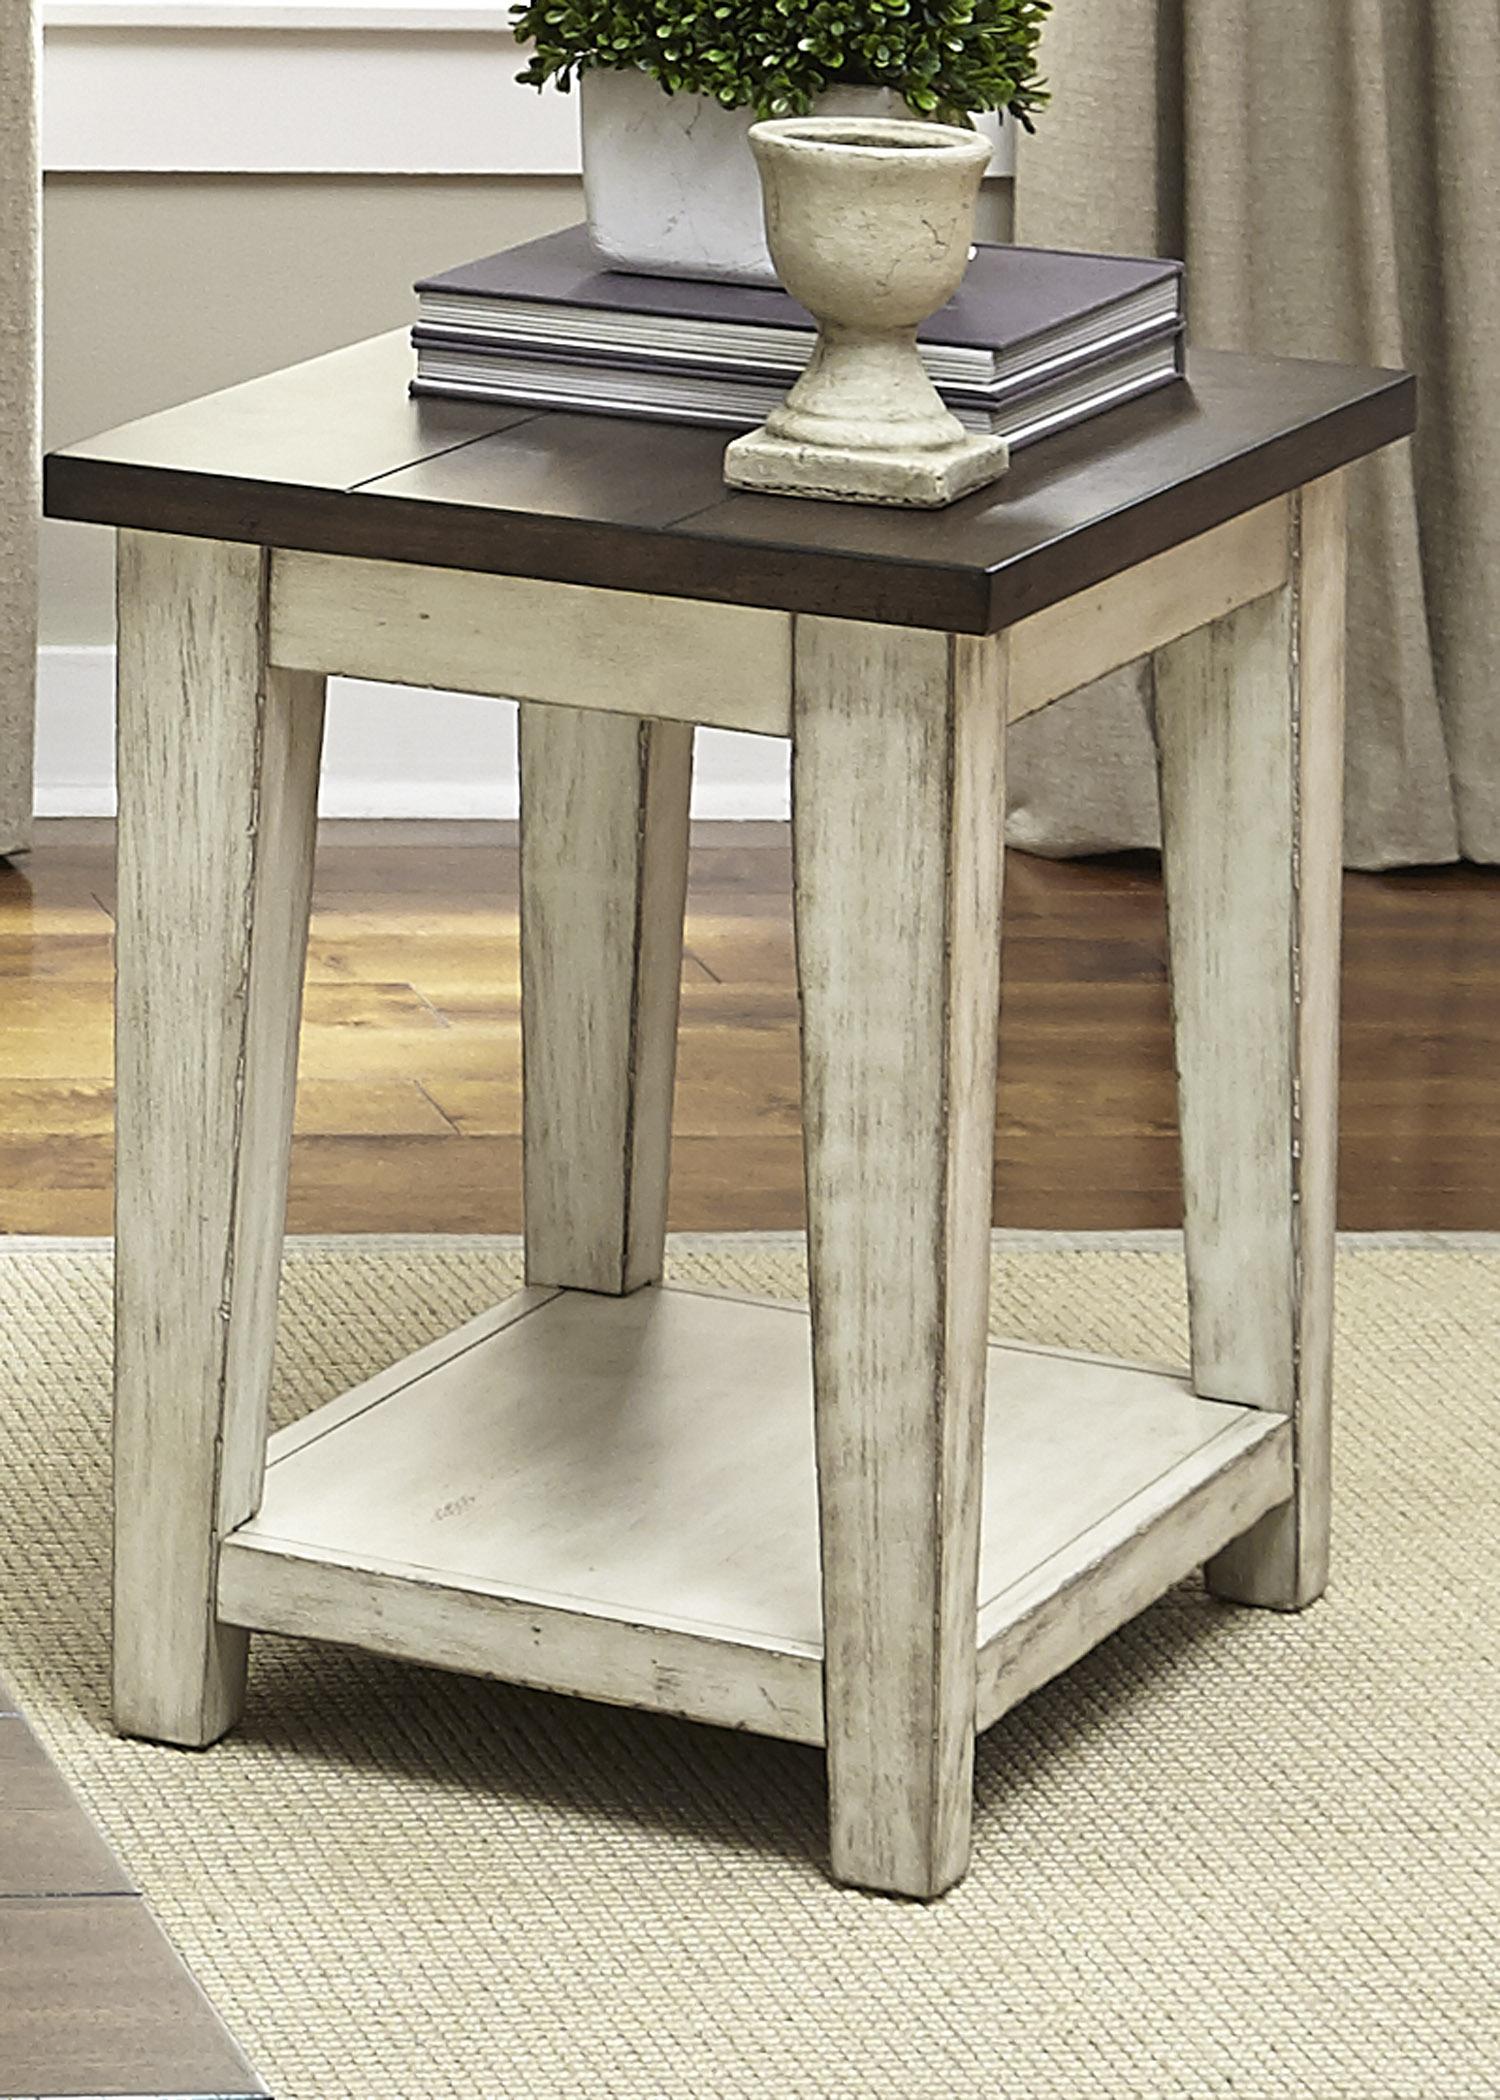 Rotmans Liberty Furniture Lancaster Rustic End Table  Item Number 612OT1021